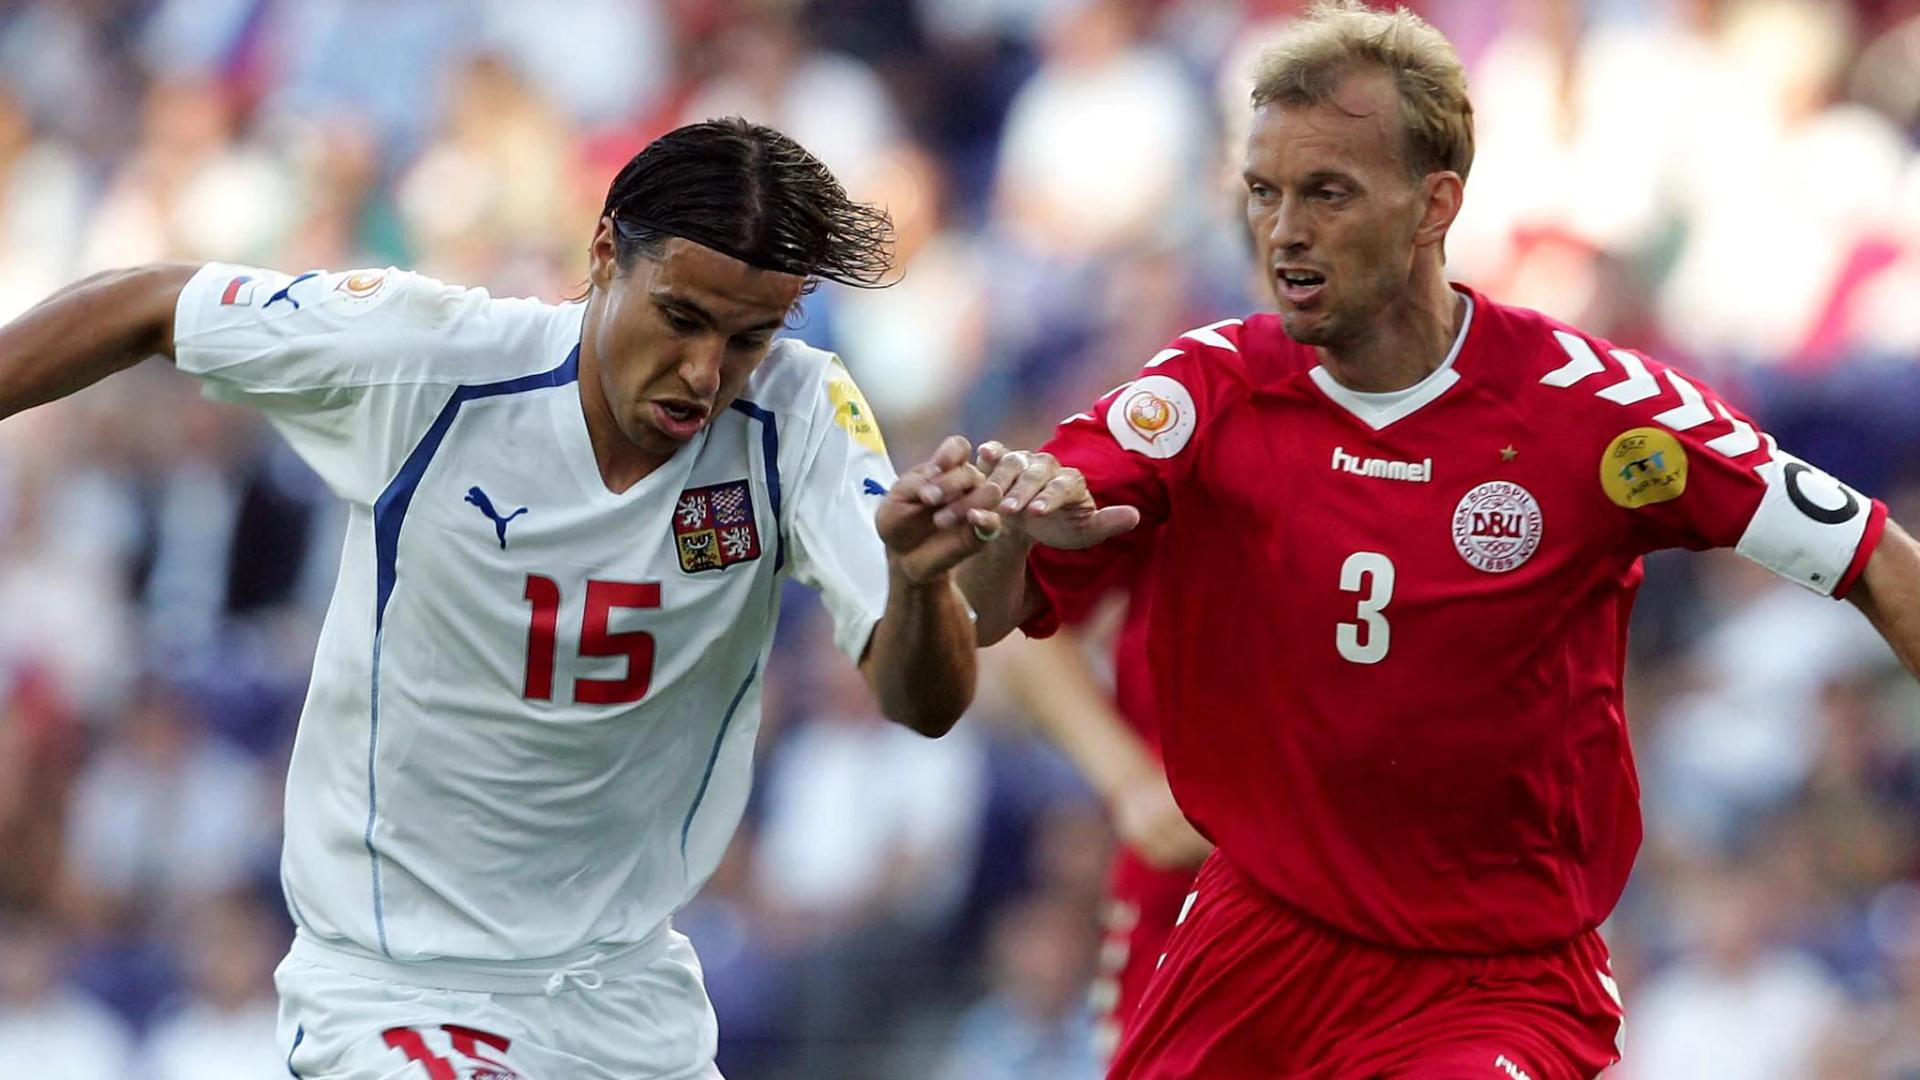 How to watch Czech Republic vs Denmark: TV channels, live stream, online